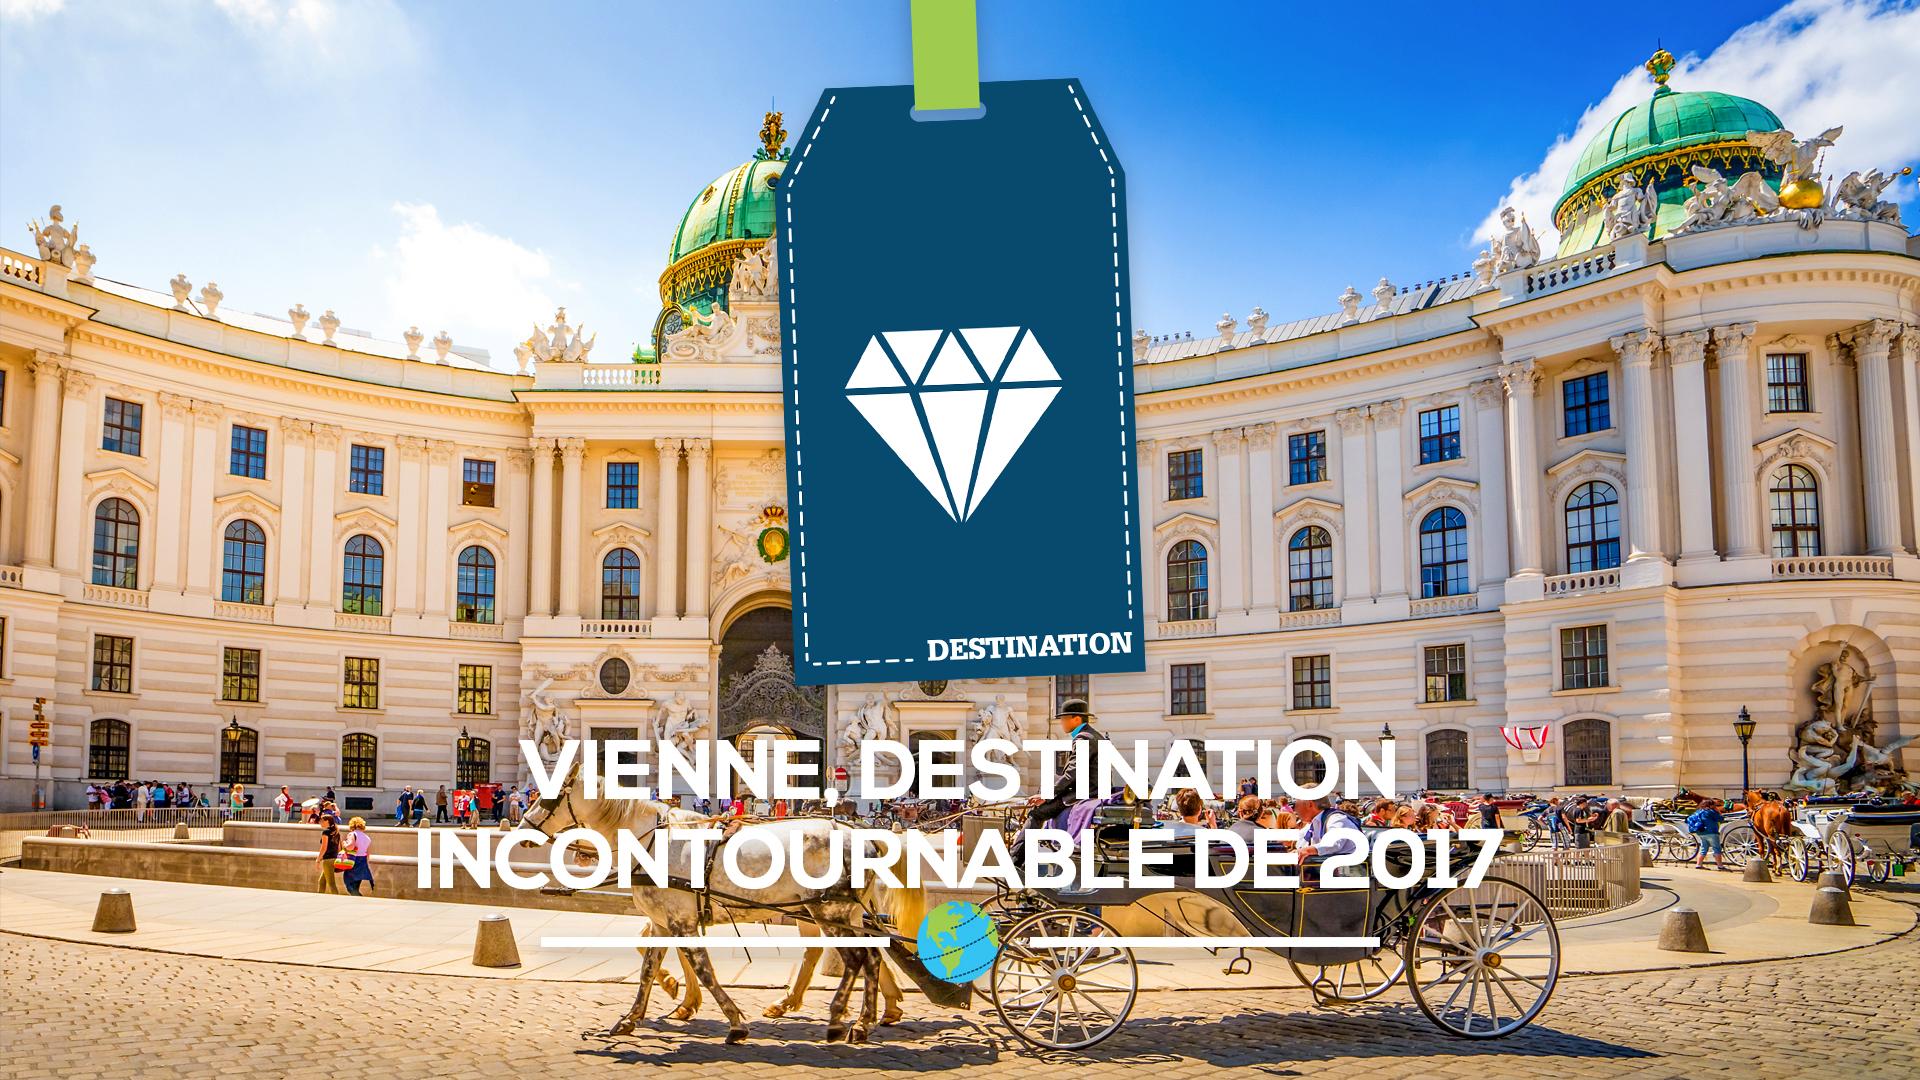 destination vienne incontournable 2017